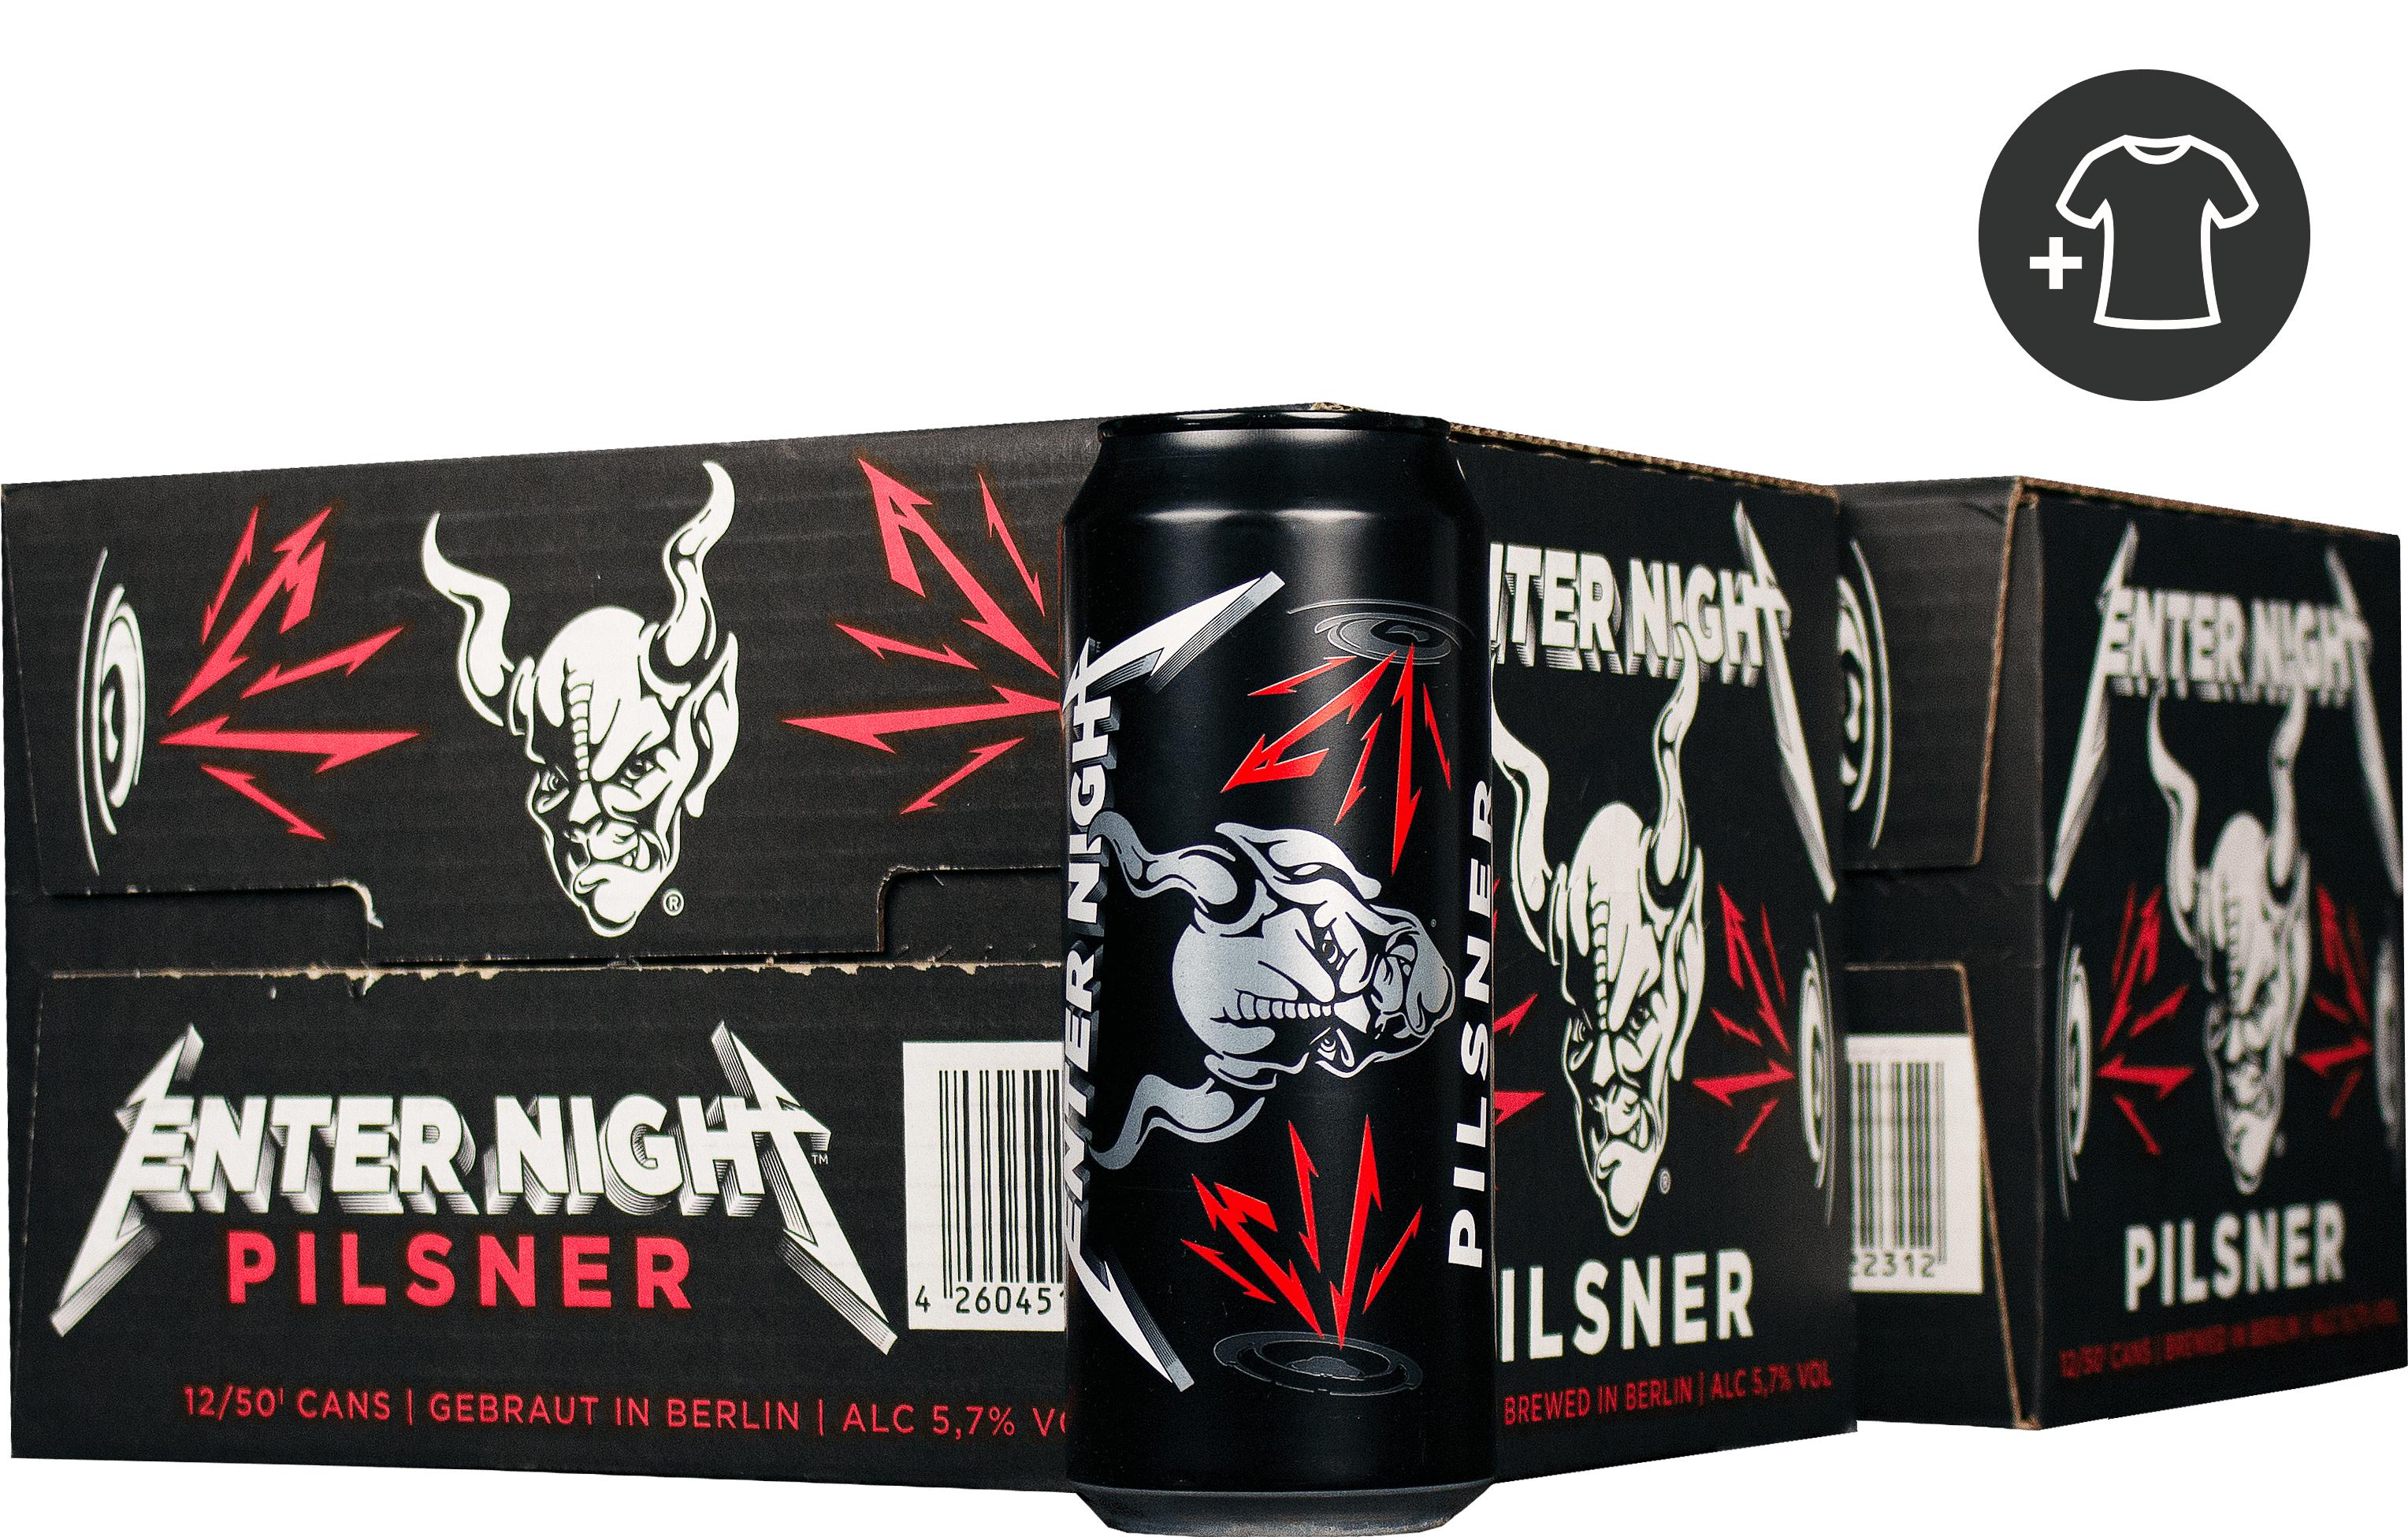 Pack de 24 bières Stone Enter Night Pilsner (24x50 cl) + tee-shirt Metallica (différentes tailles)